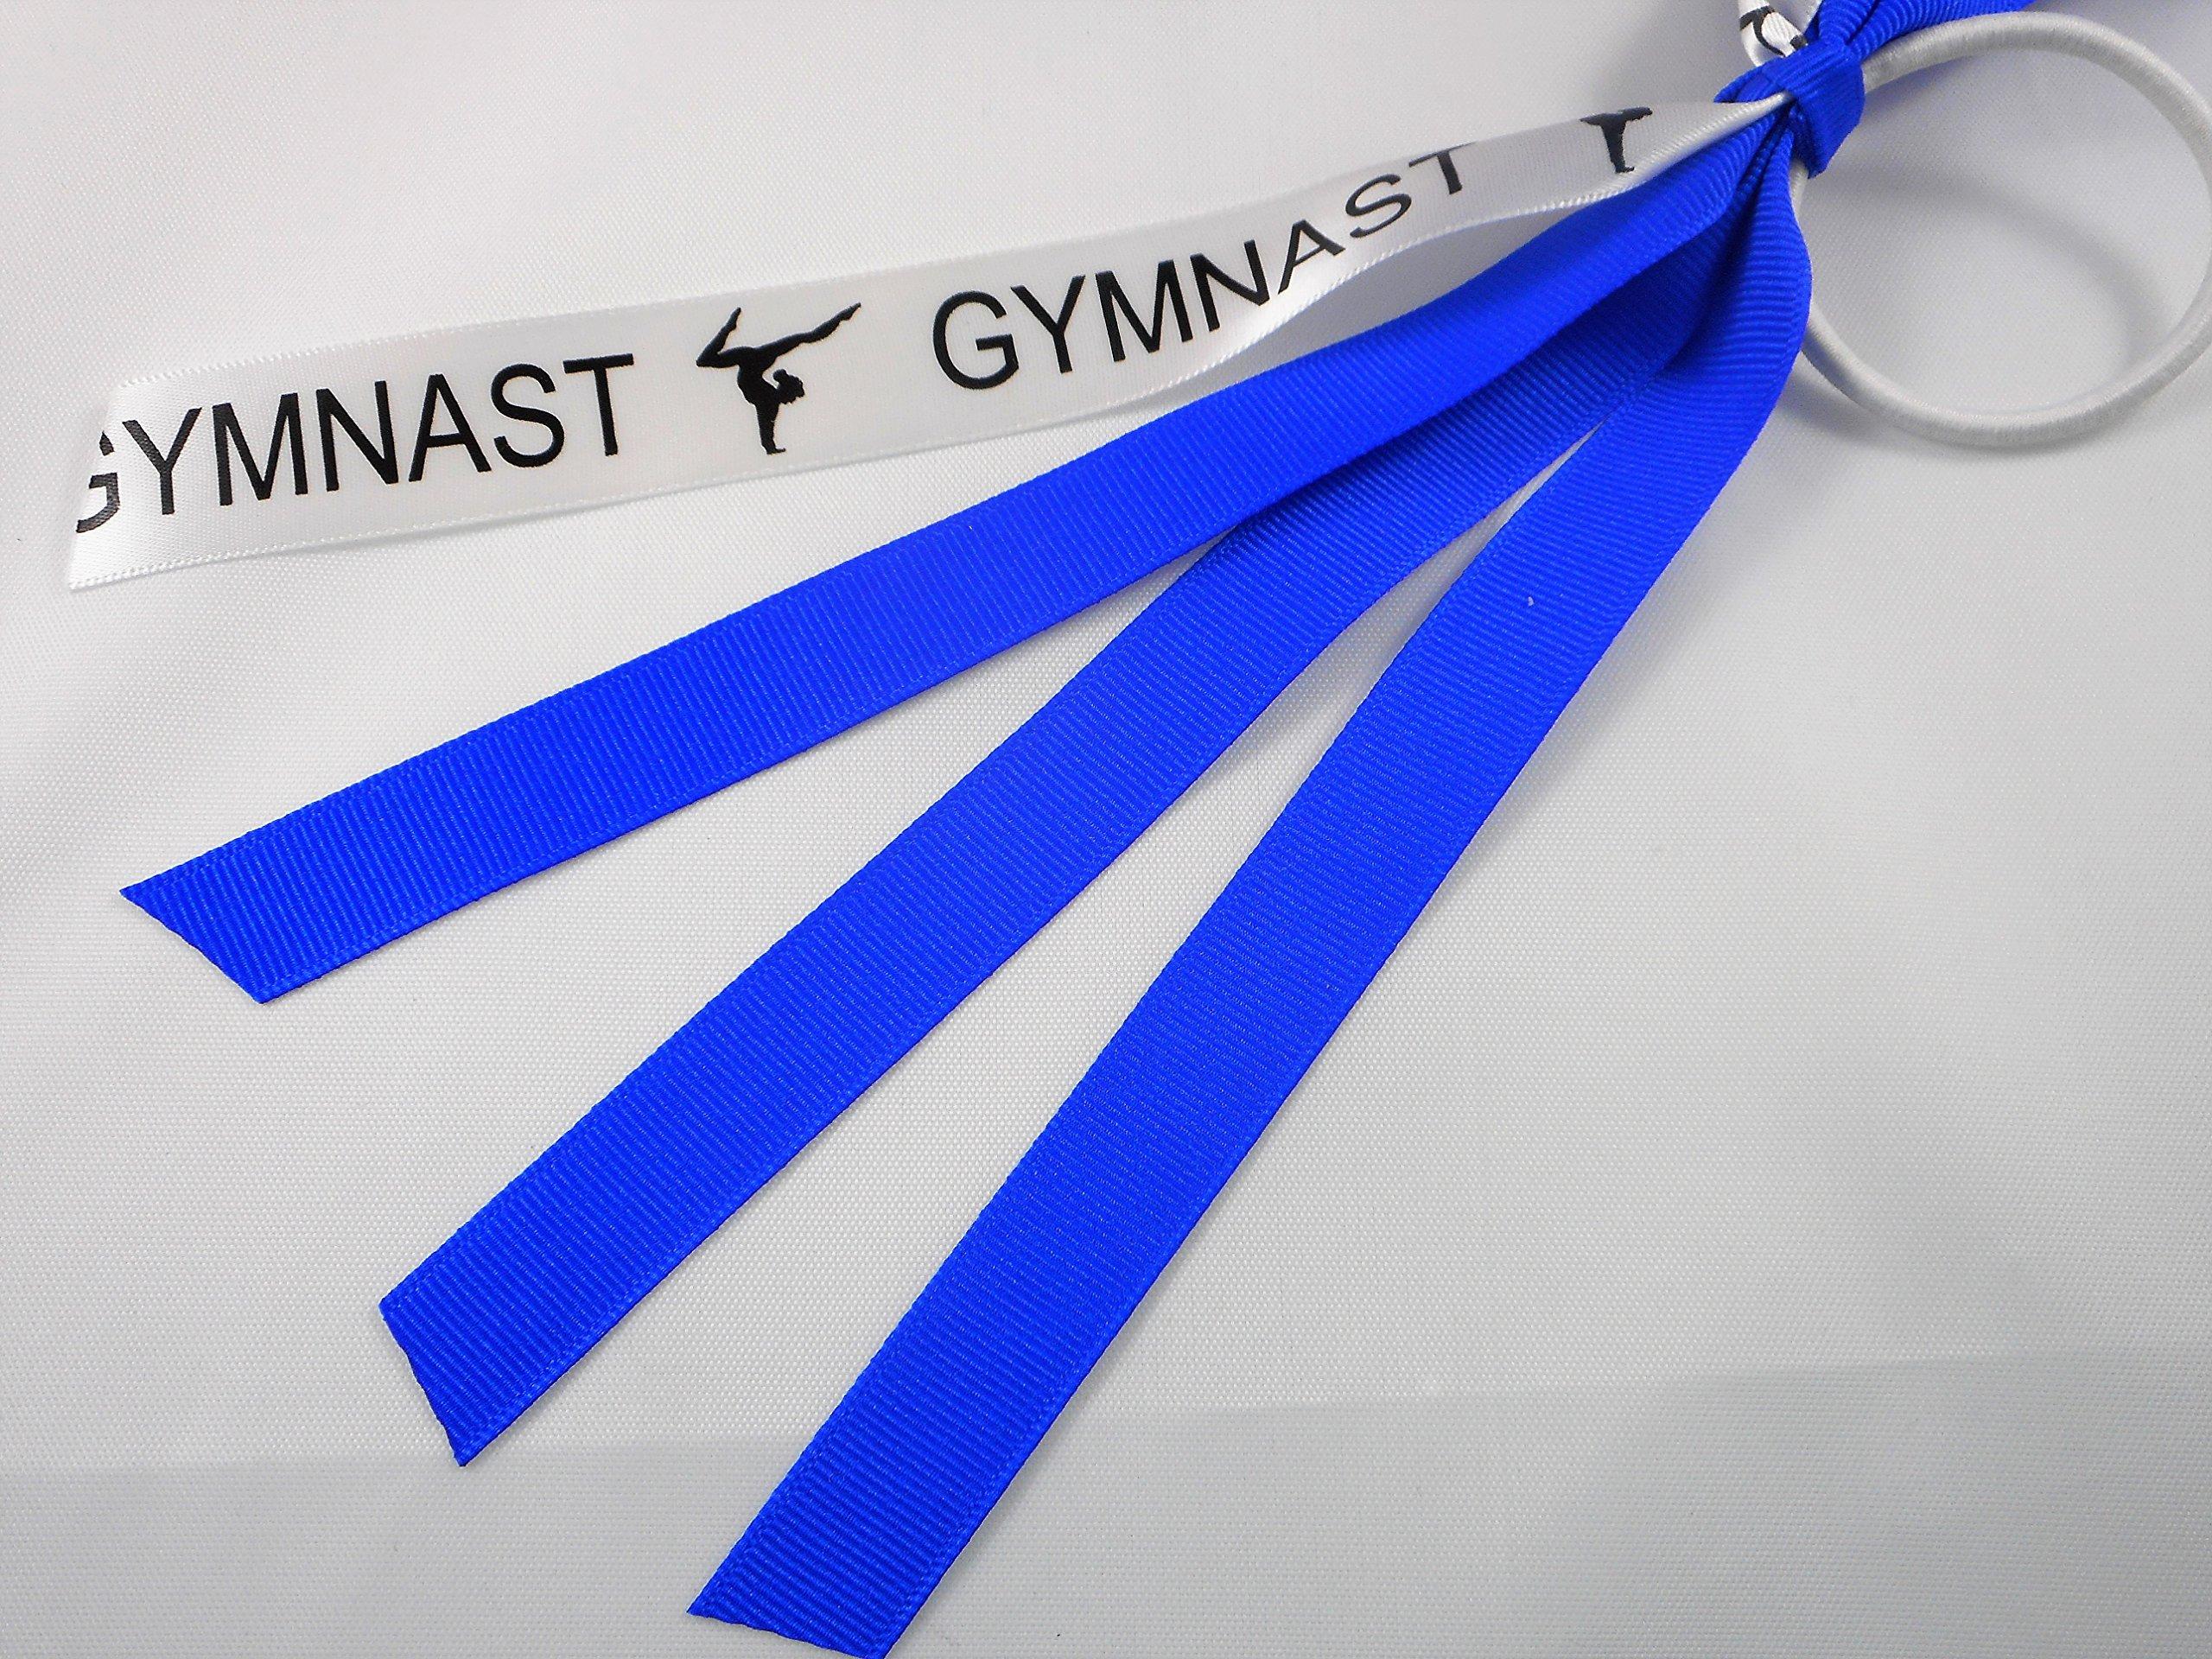 Gymnastics Pony Tail Hair Tie Ribbon Streamers Royal Blue